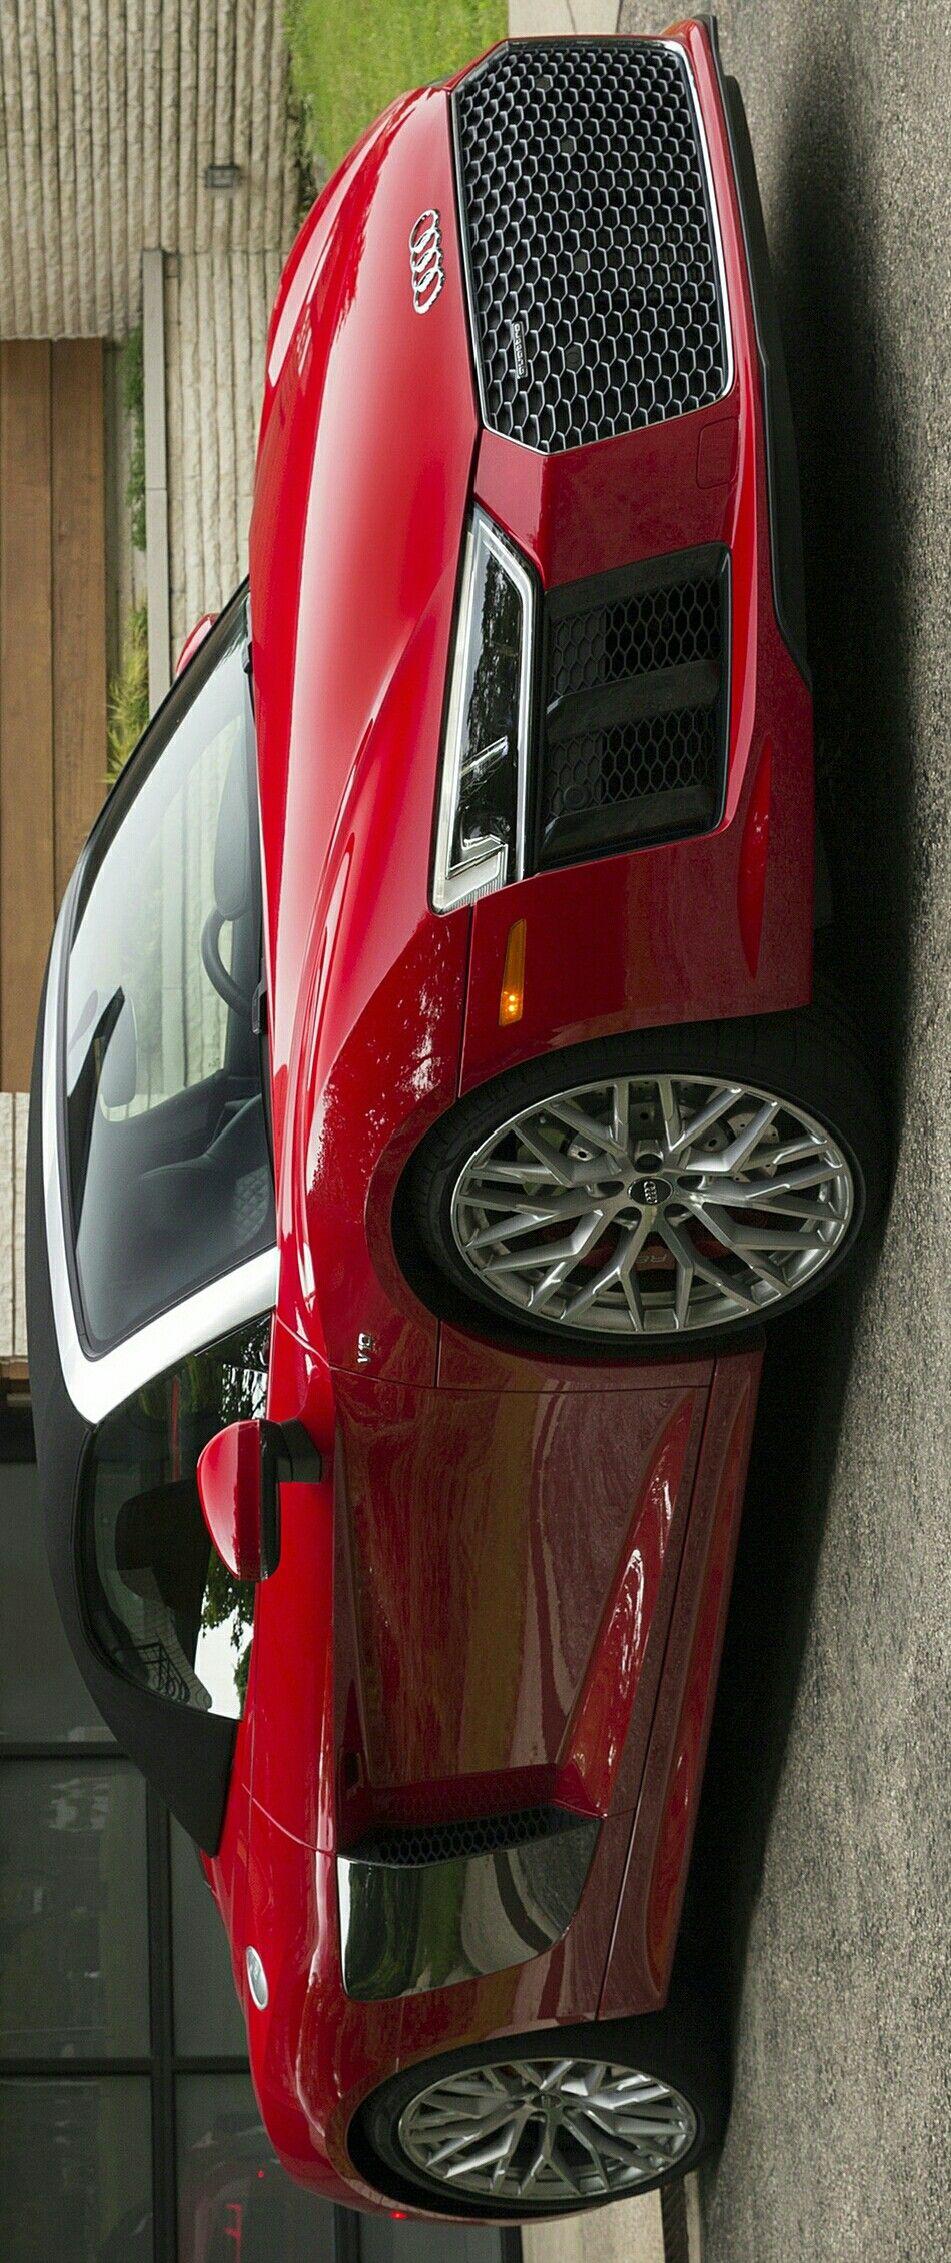 ce98764b92c1569d94ae2eb2ad136bf2 Extraordinary Porsche 918 Spyder Weissach Package Precio Cars Trend